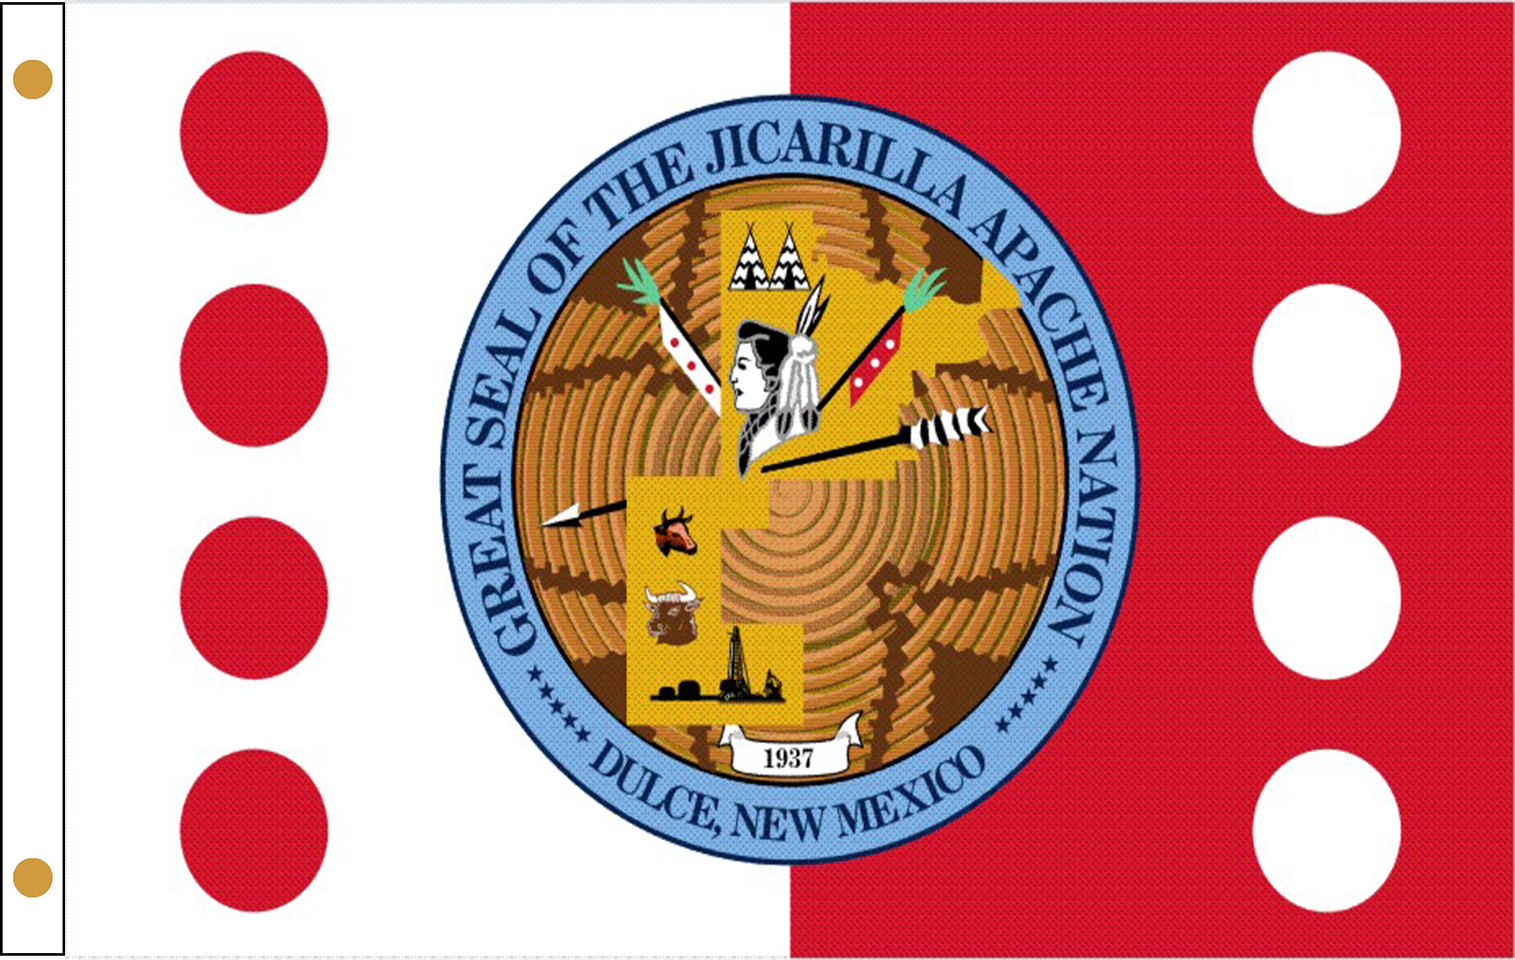 Jicarilla Apache Tribe Flags